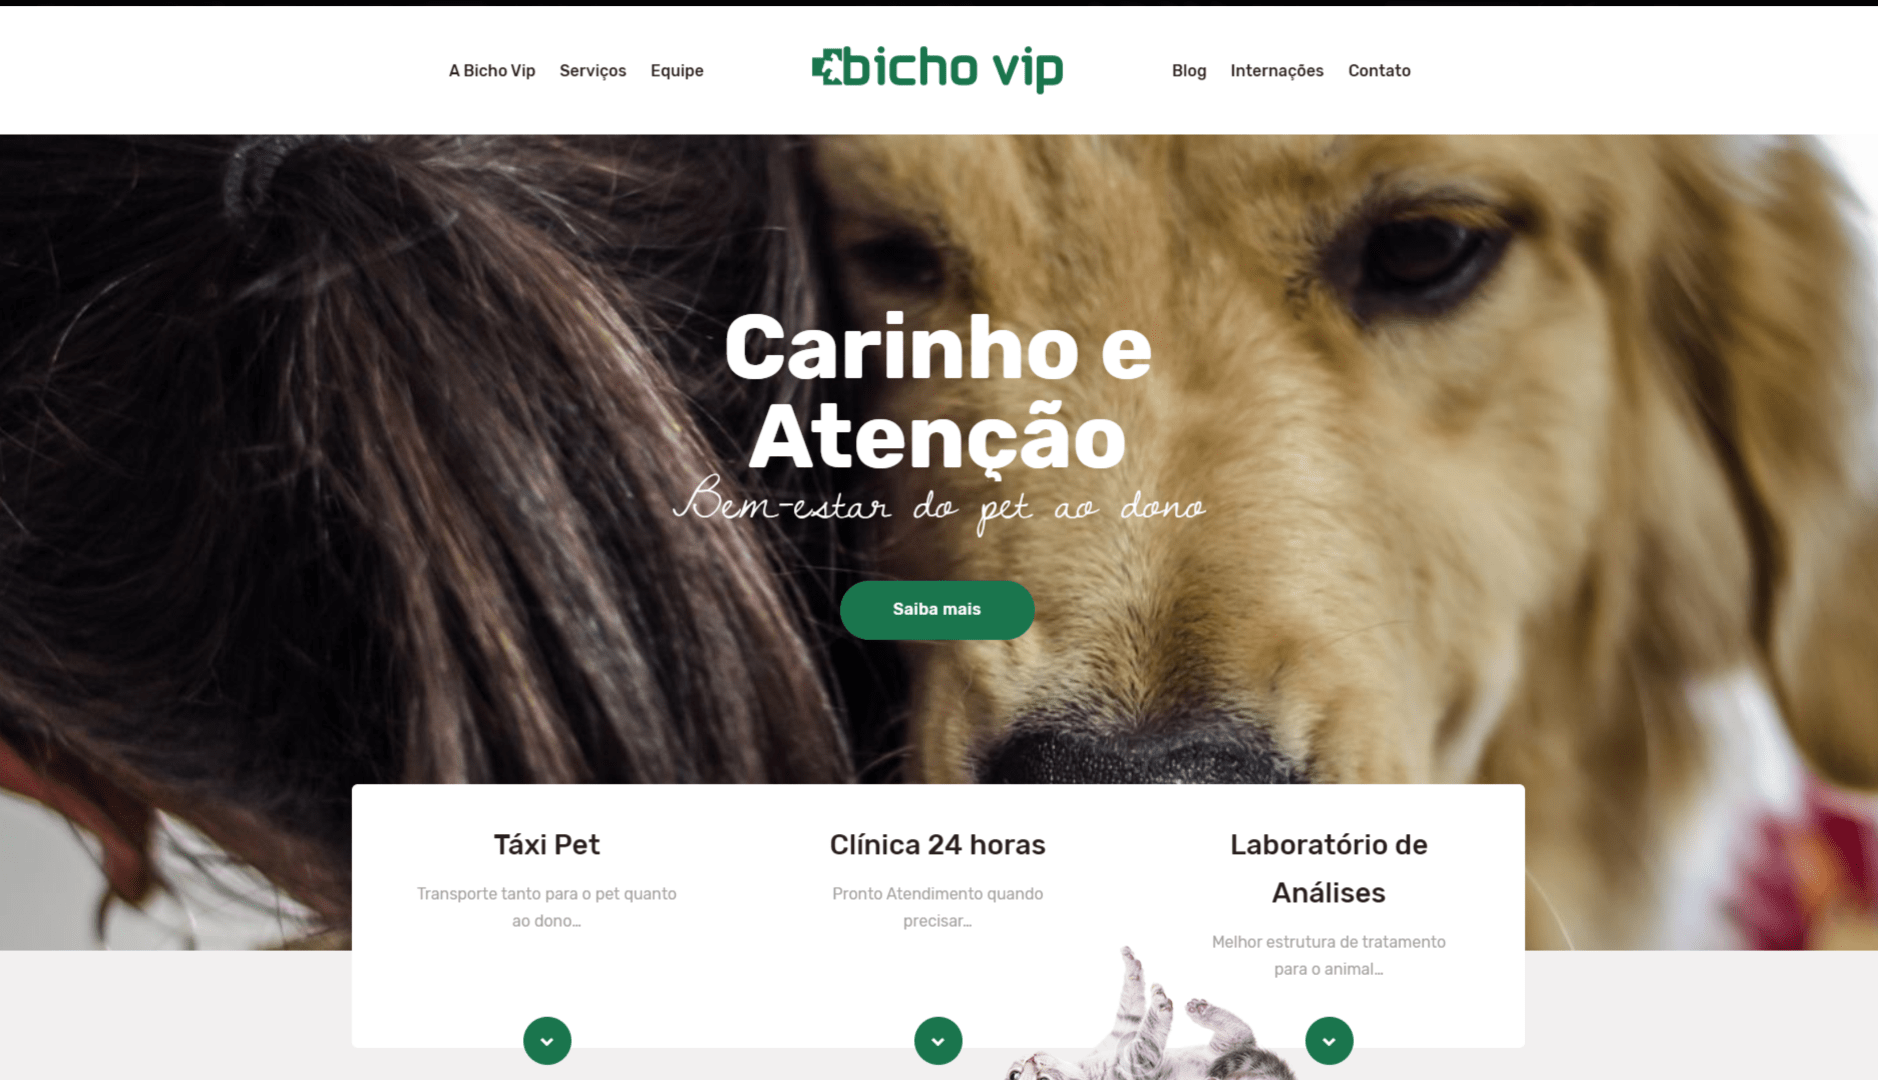 https://www.6i.com.br/case/bicho-vip/